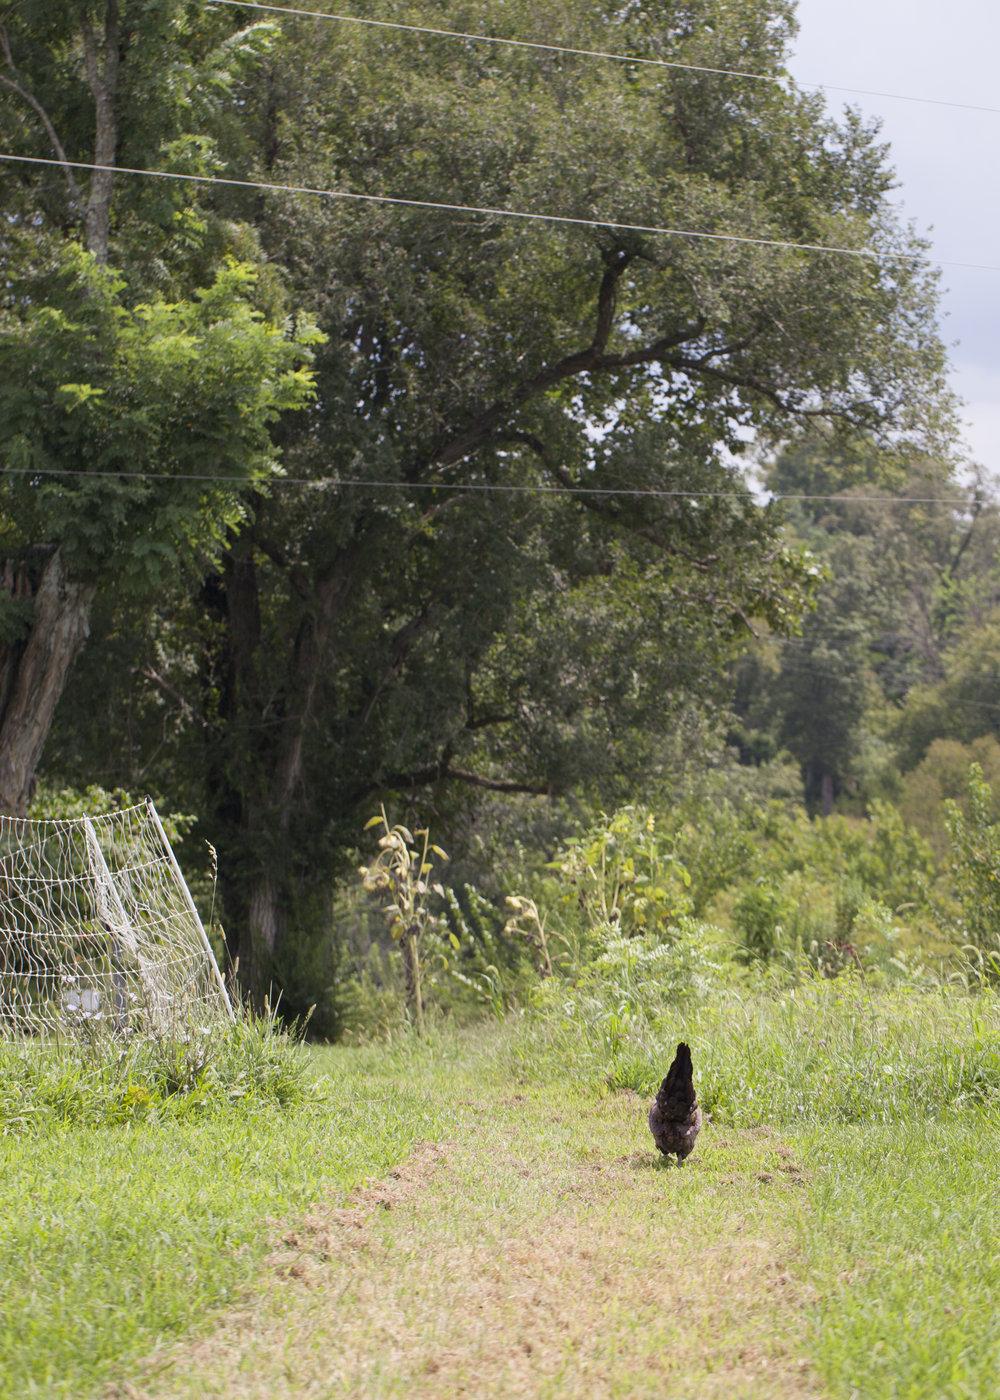 Farm Chicken Walking.jpg